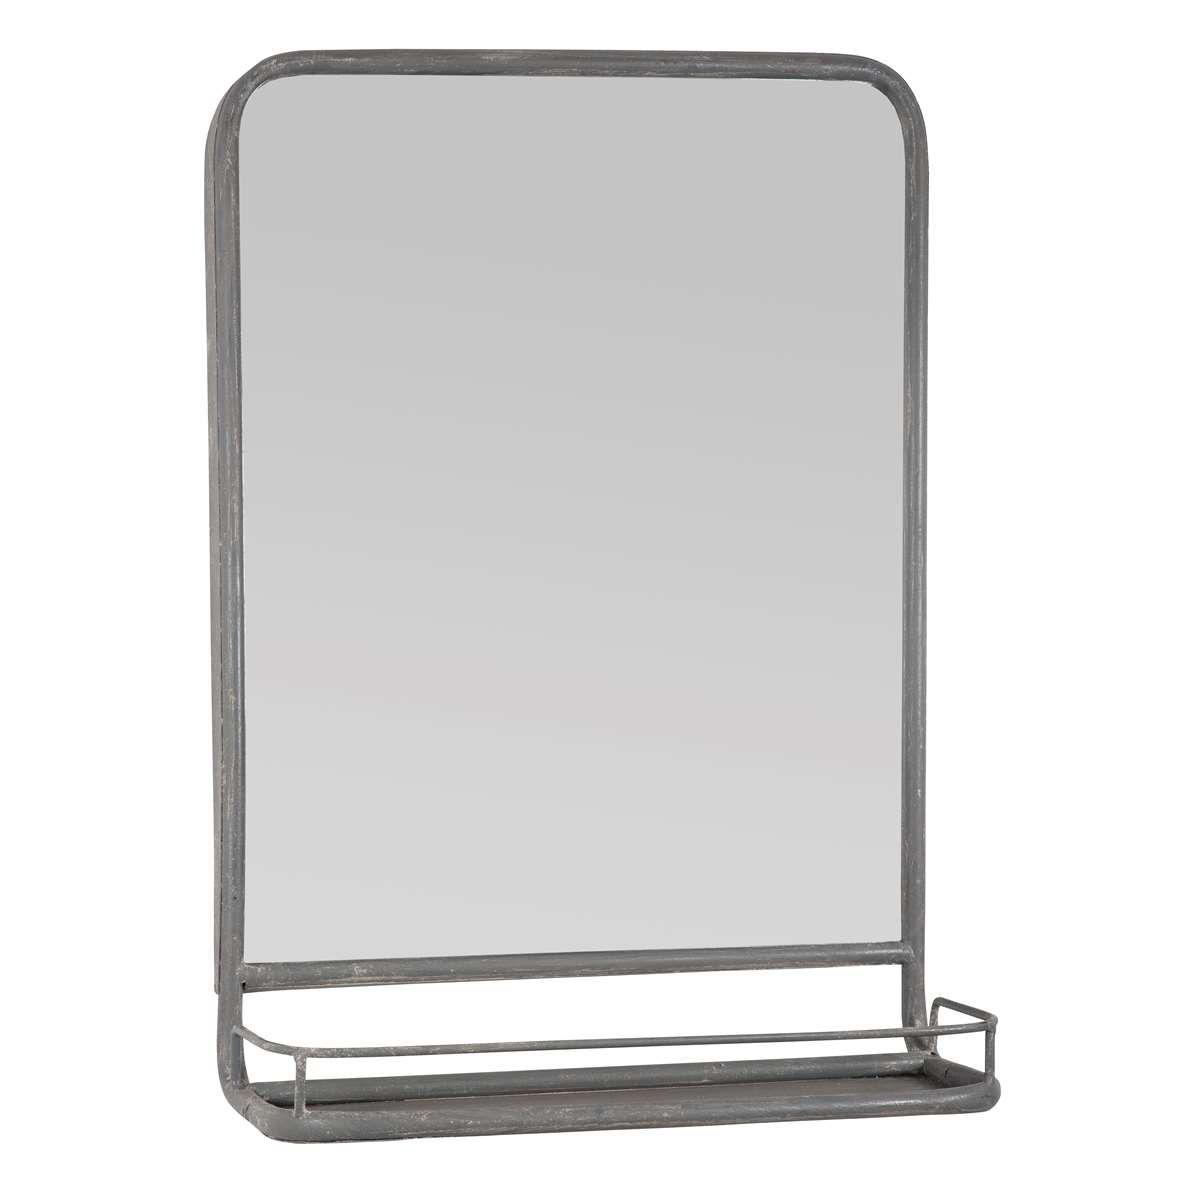 Wandspiegel M/Miniablage - Ib Laursen